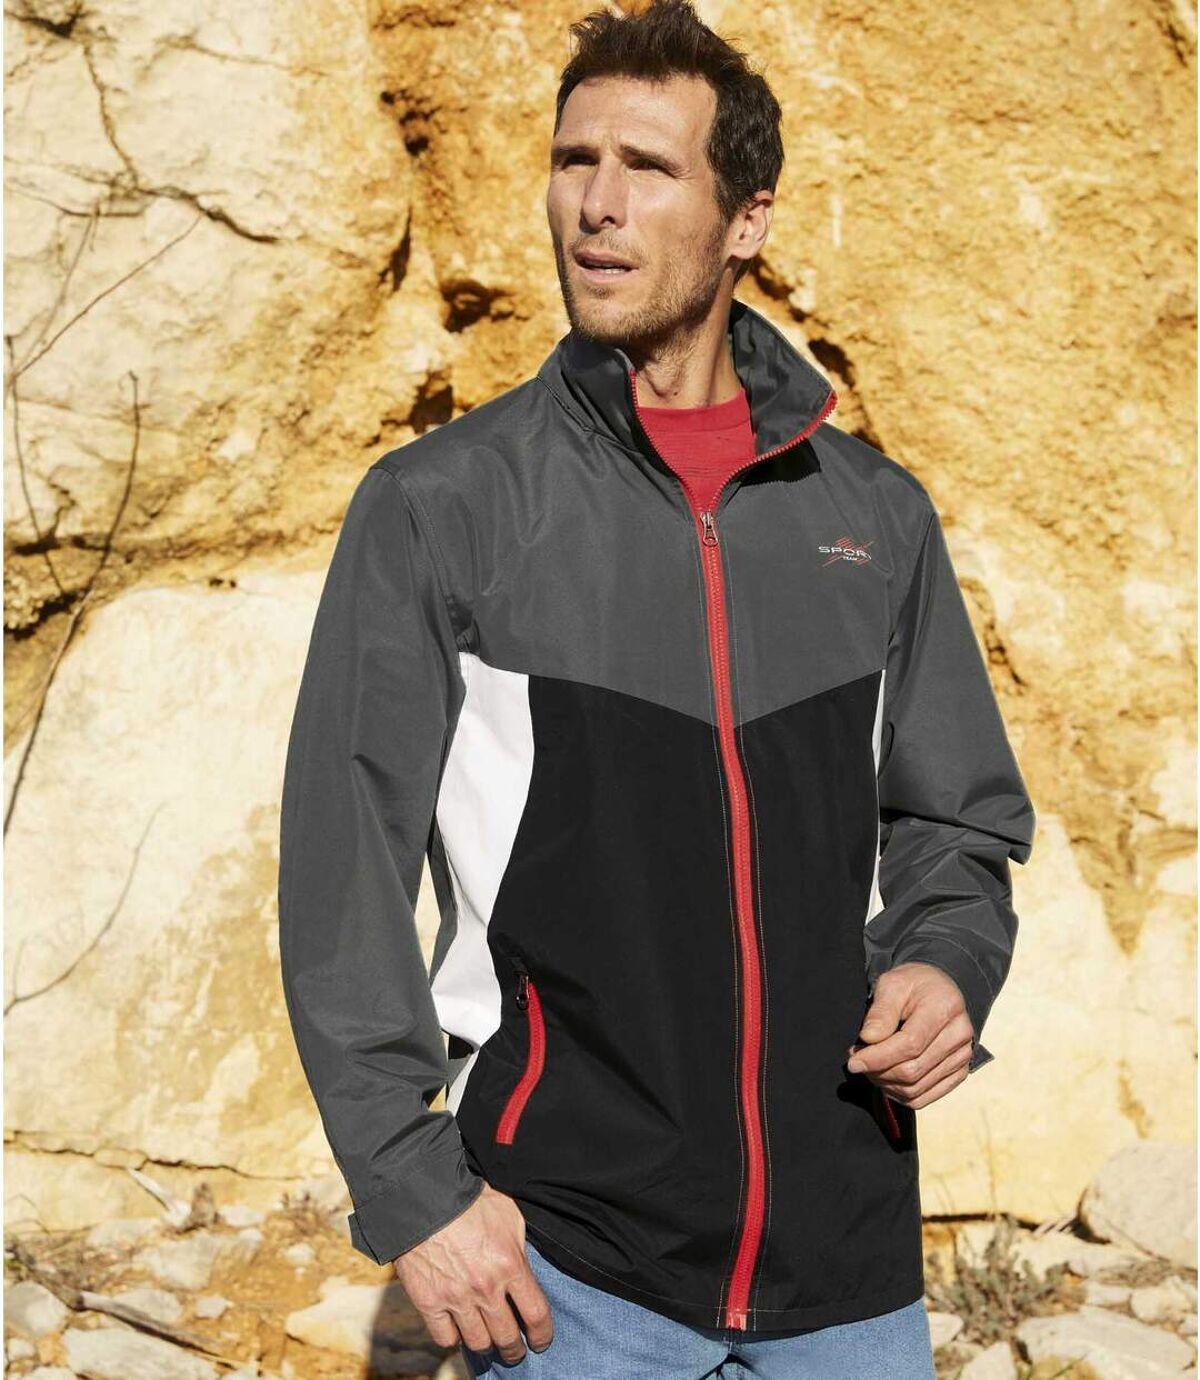 Men's Sporty Full Zip Windbreaker - Water-Repellent - Foldaway Hood - Grey White Black Atlas For Men